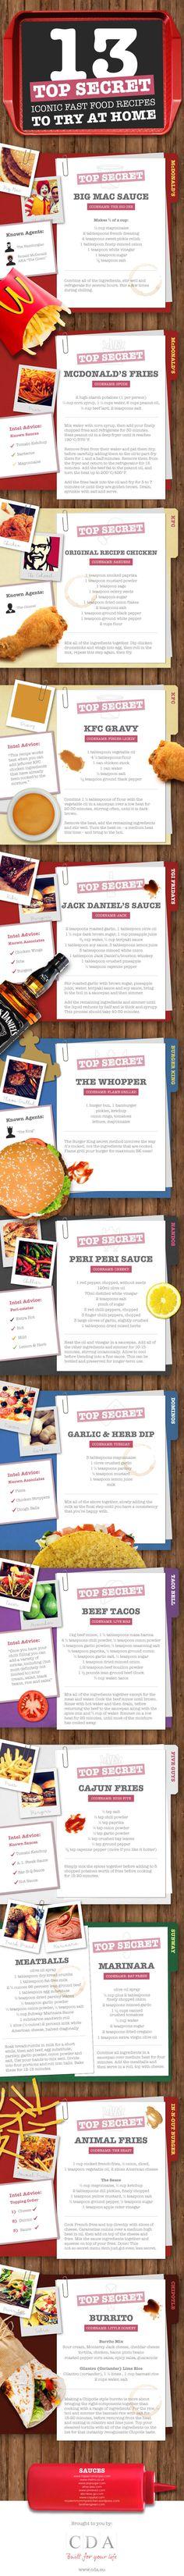 Secret Recipes of Famous Fast Food Restaurants Infographic